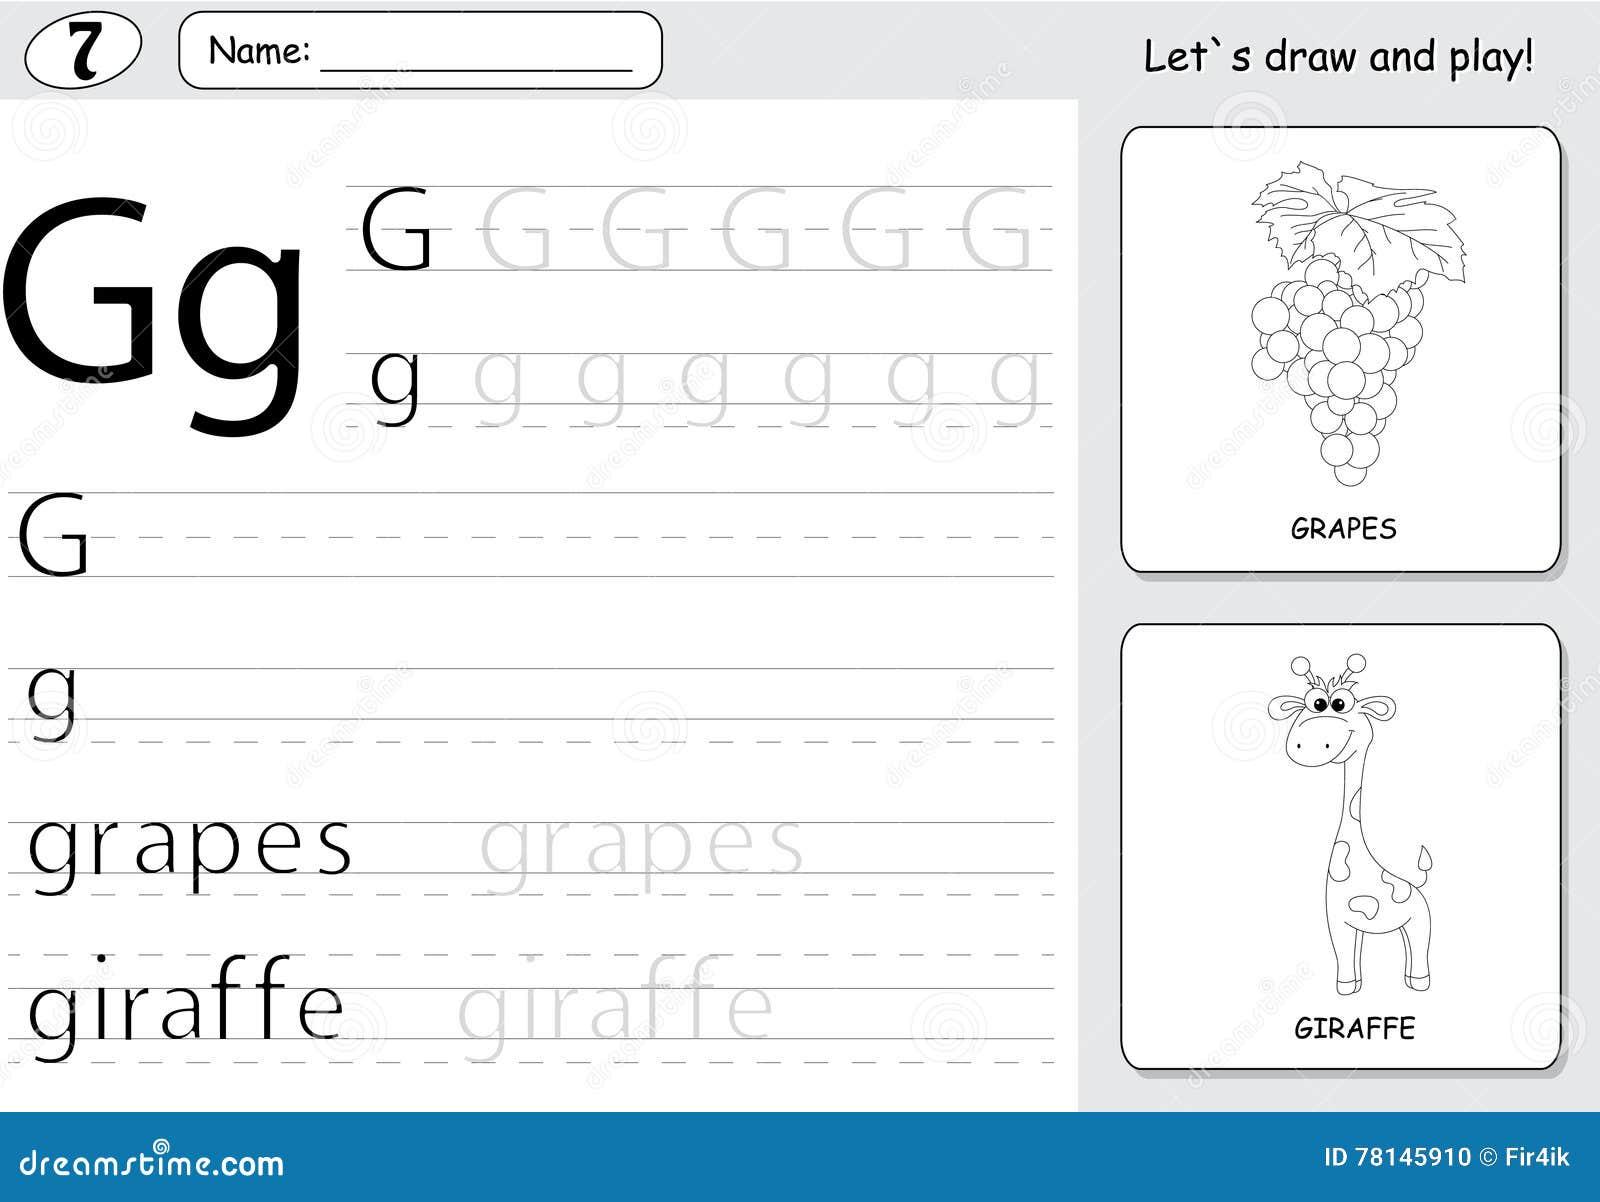 cartoon grapes and giraffe alphabet tracing worksheet writing